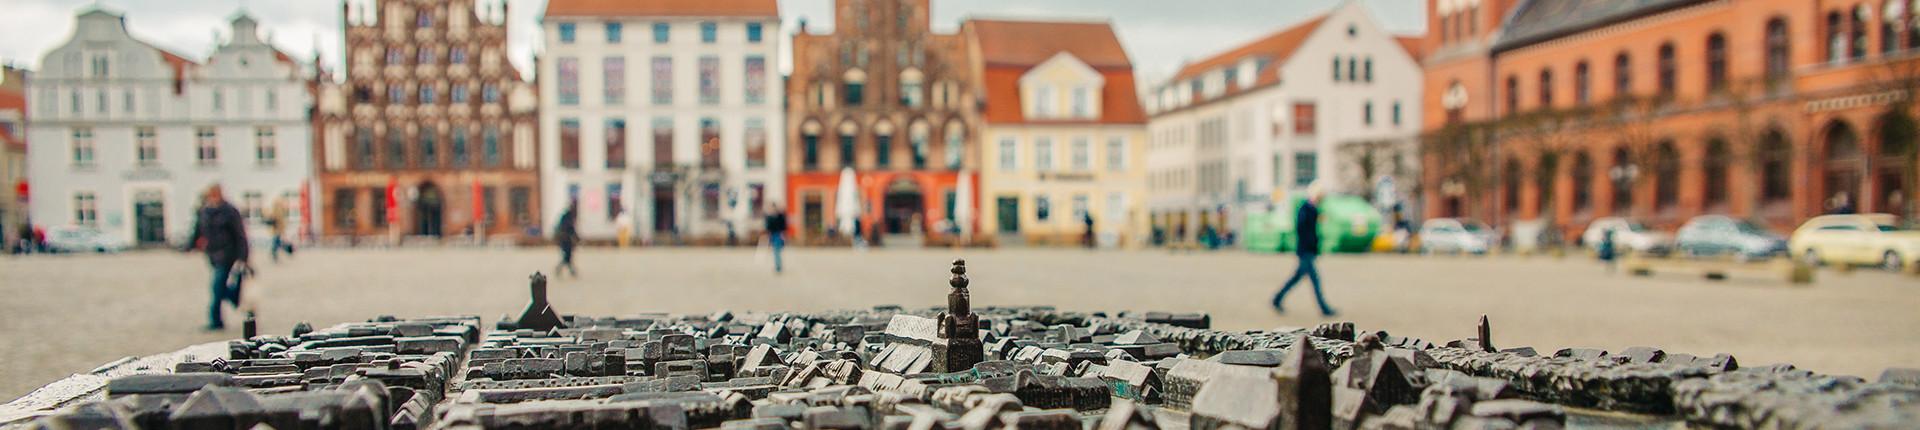 stadtrelief-am-marktplatz